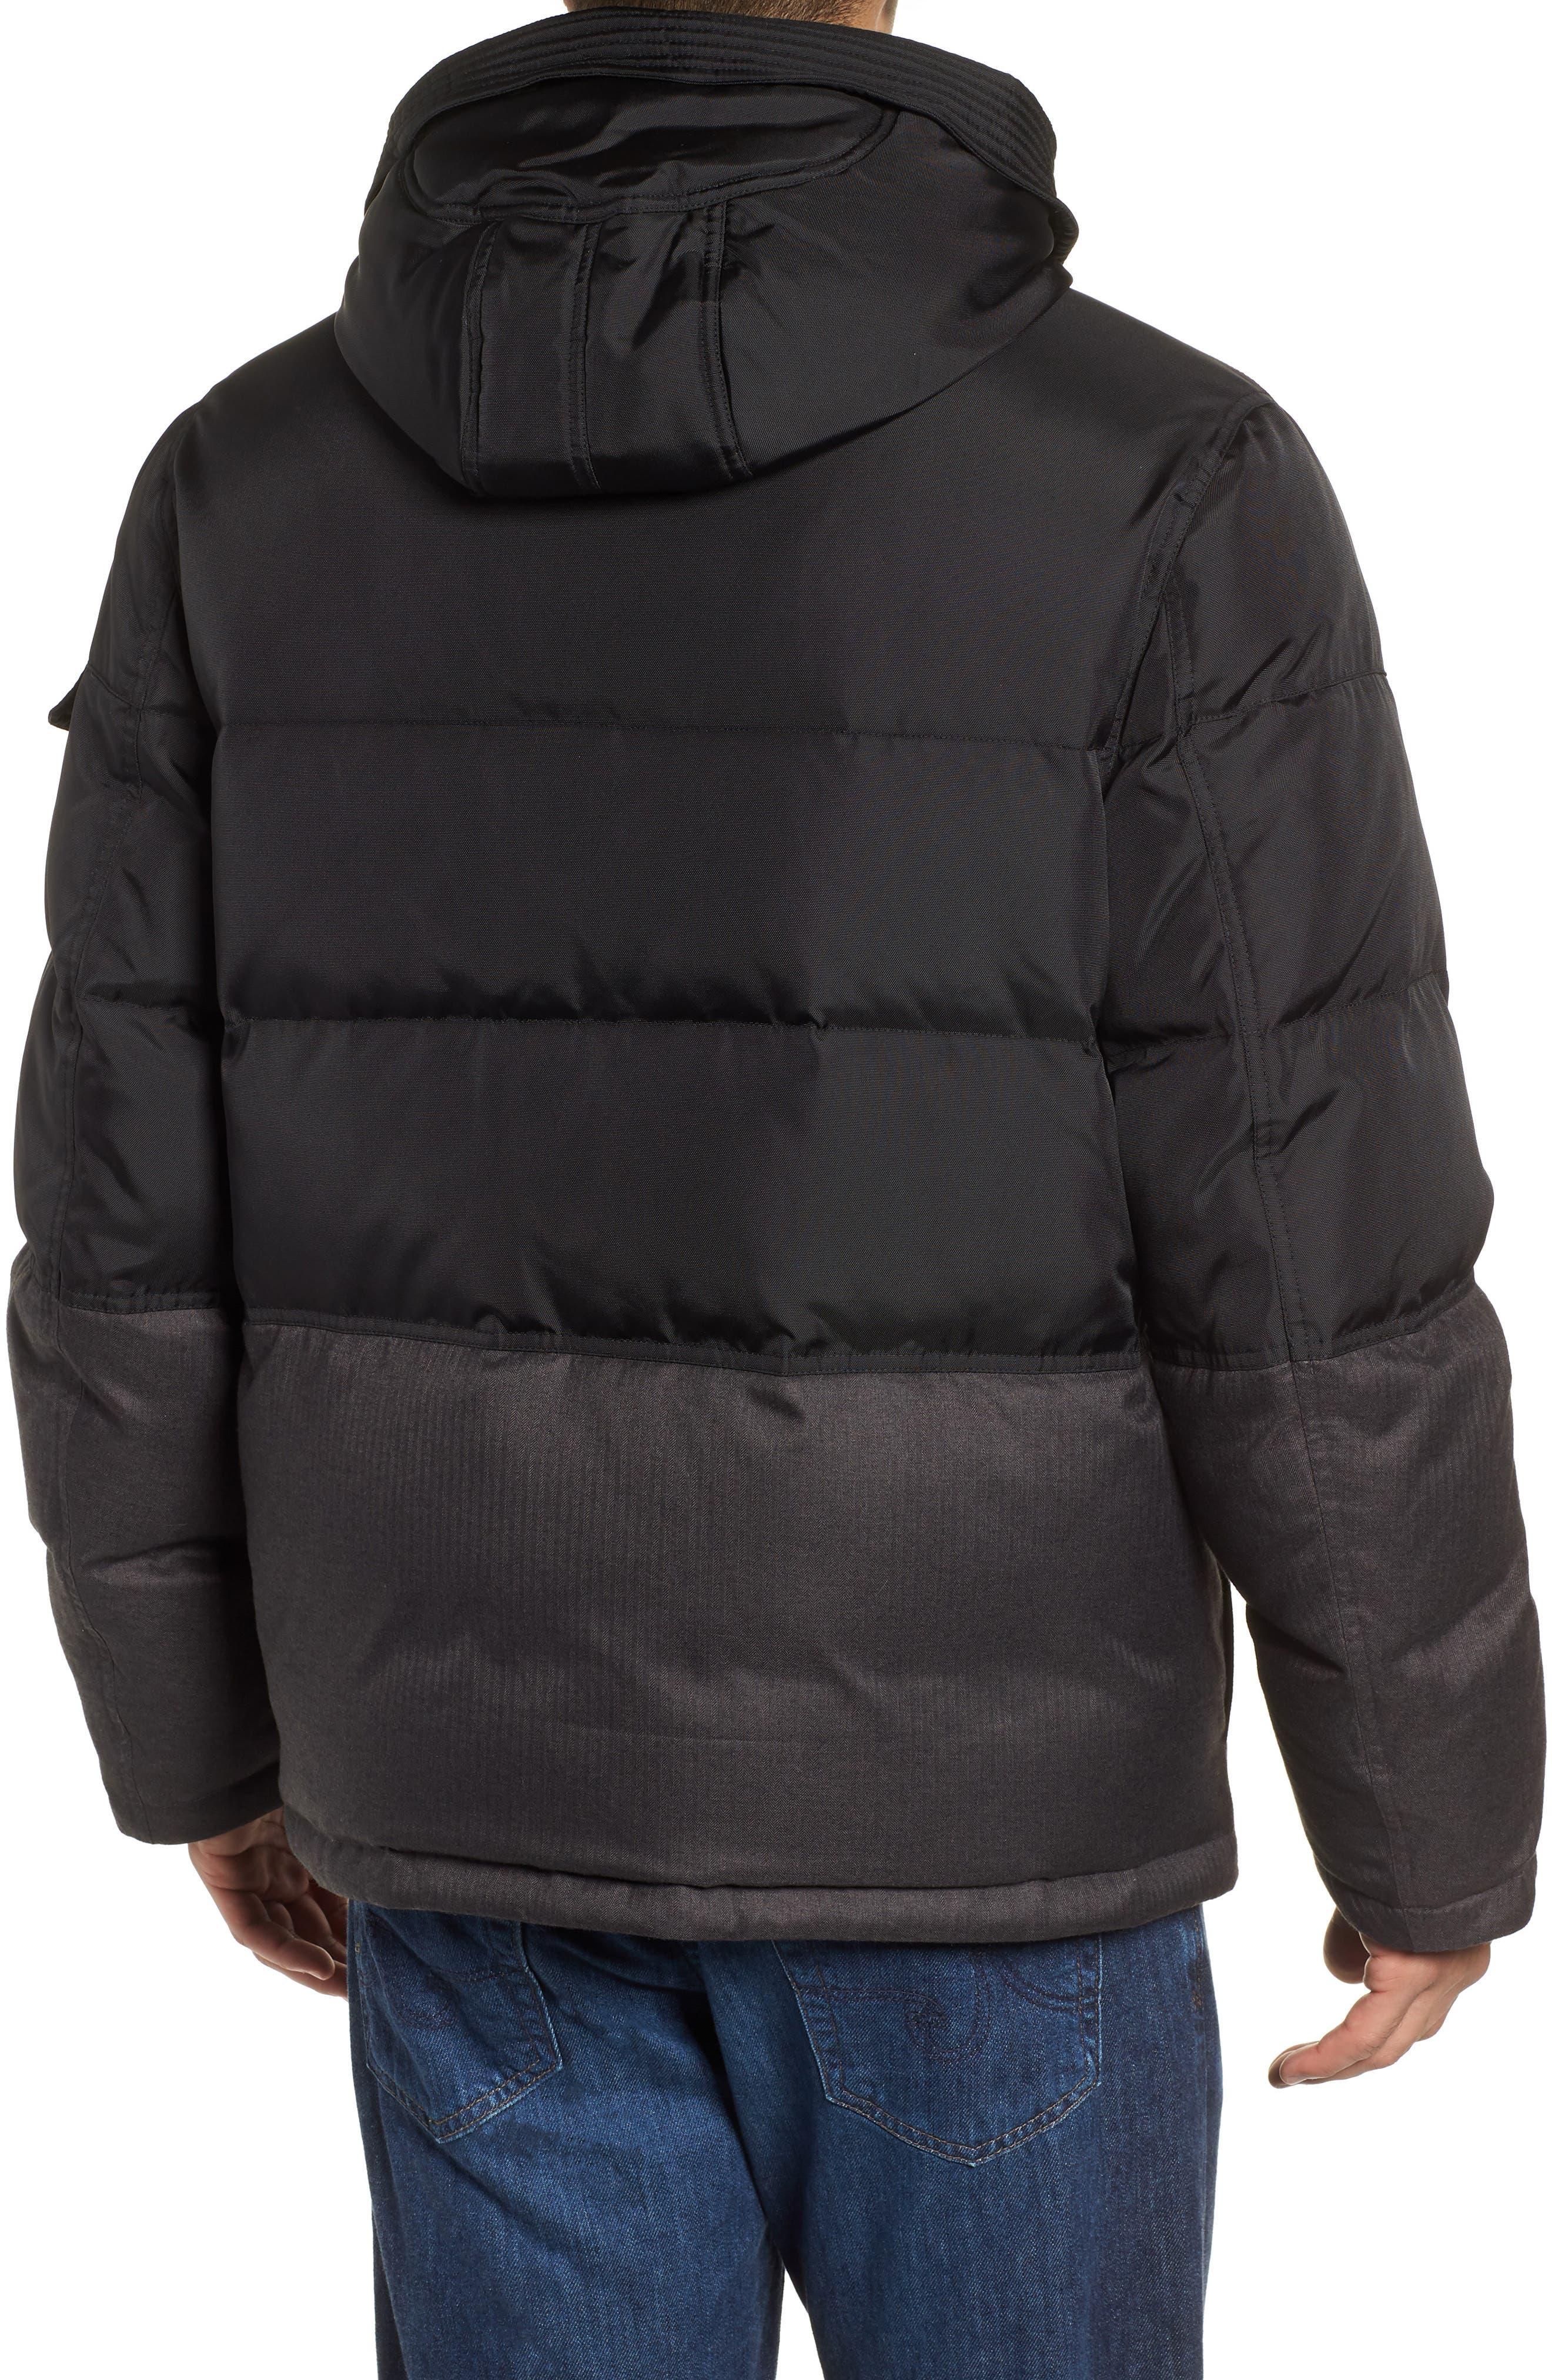 MARC NEW YORK,                             Stanton Oxford Puffer Jacket,                             Alternate thumbnail 2, color,                             BLACK